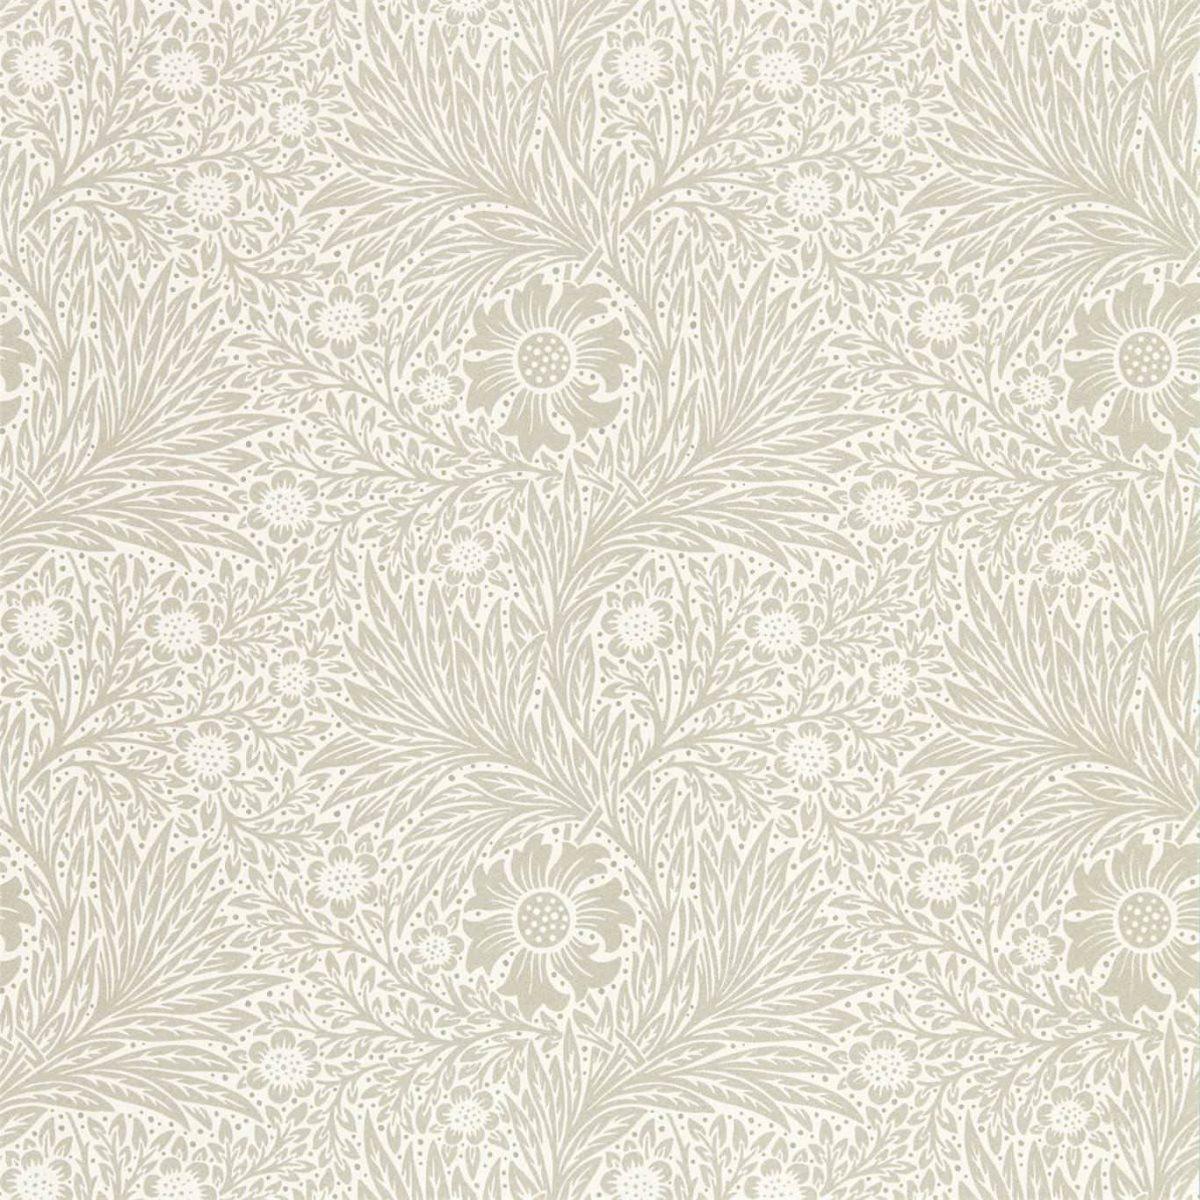 Morris & Co Tapet Pure Marigold Soft Gilver